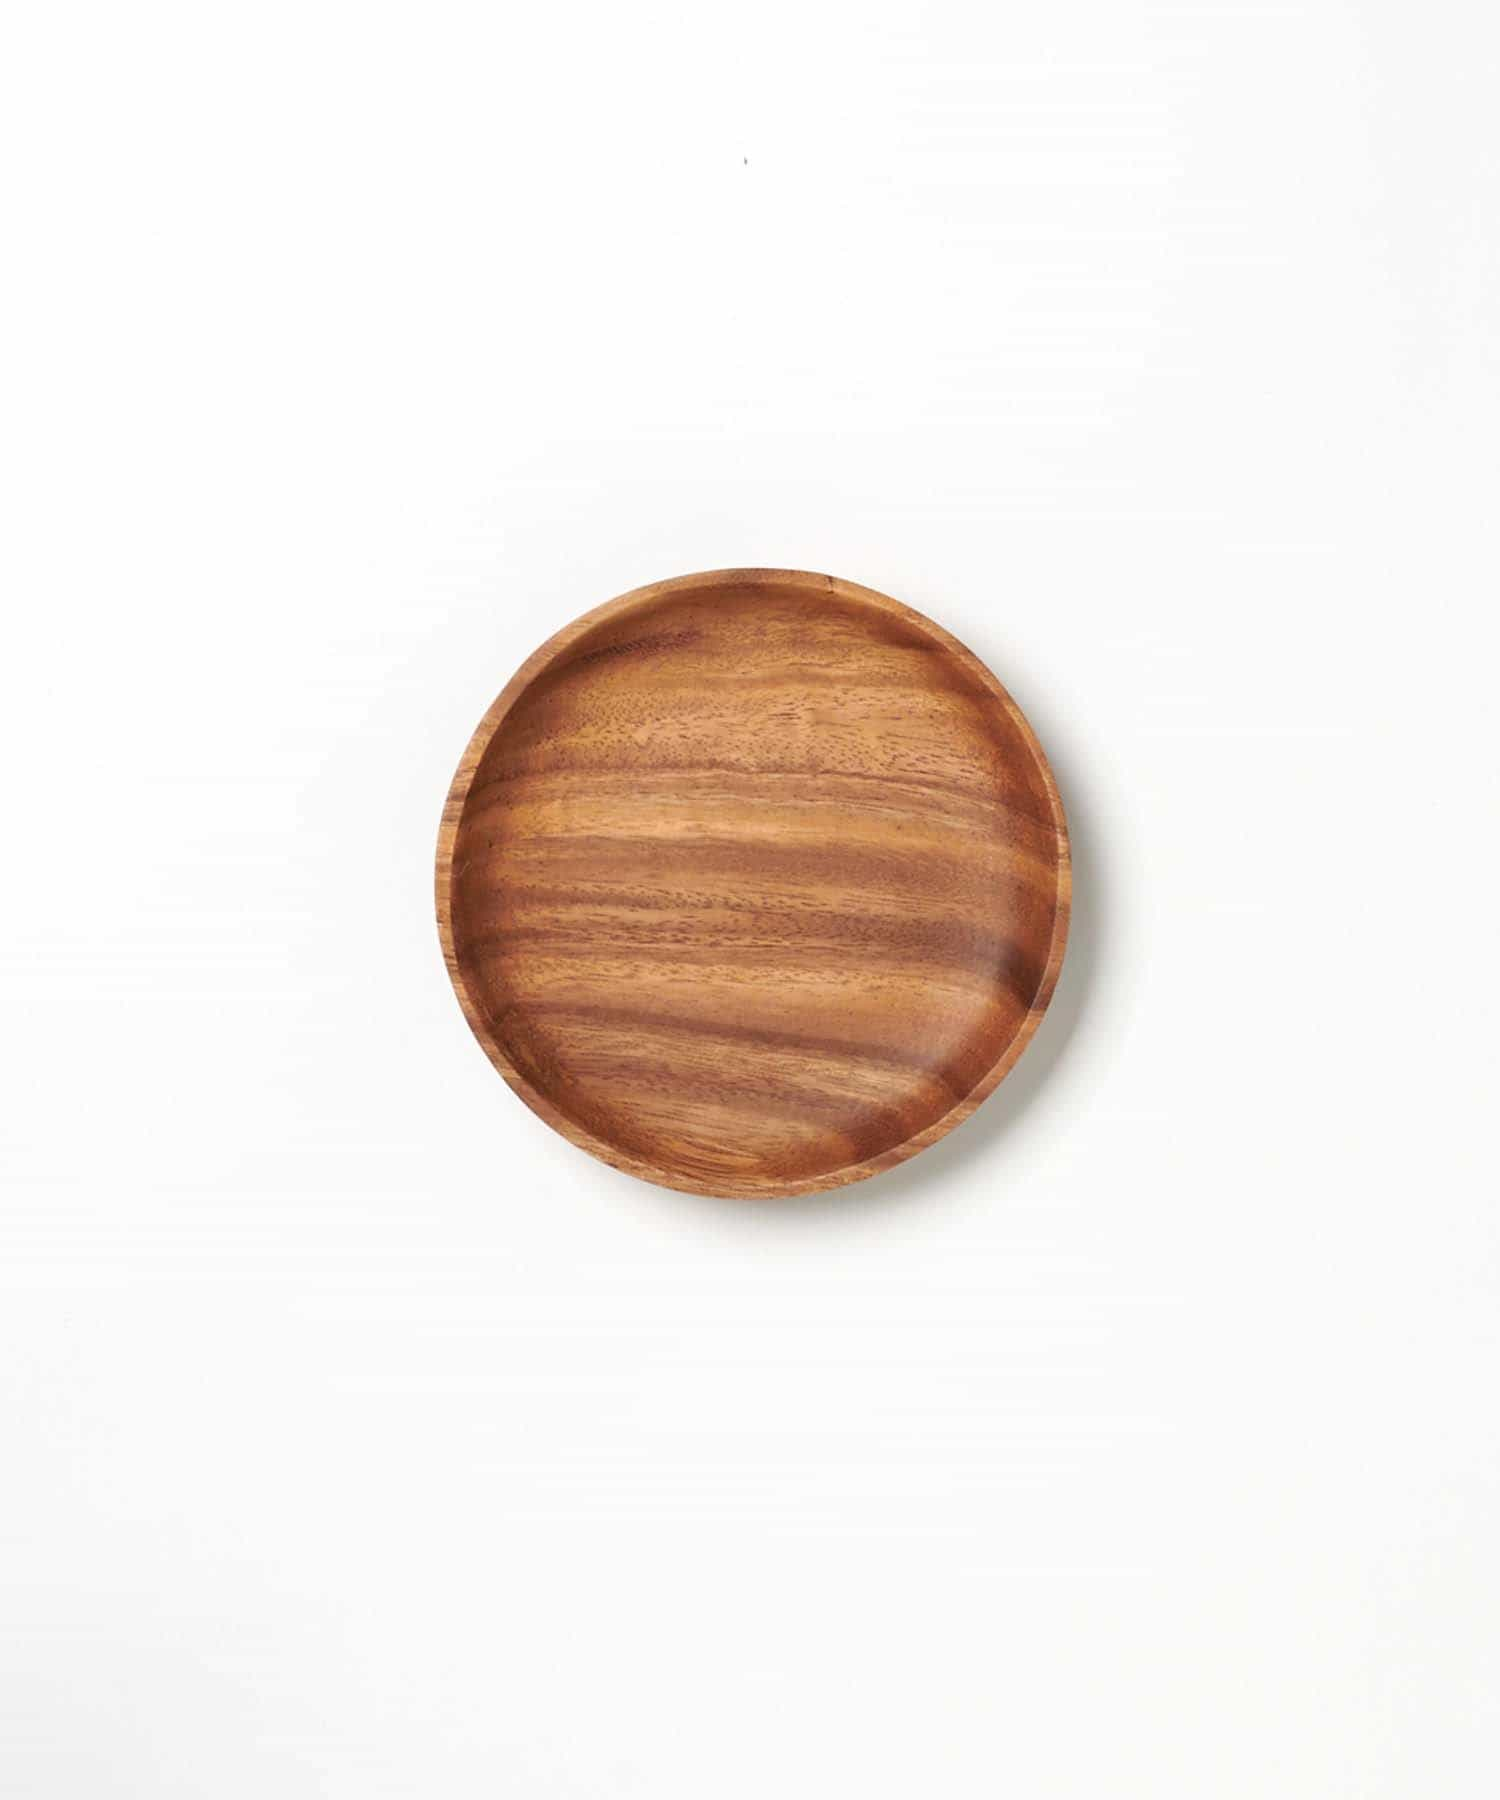 CIAOPANIC TYPY(チャオパニックティピー) 〈木製食器・お皿〉アカシアトレー ラウンド S